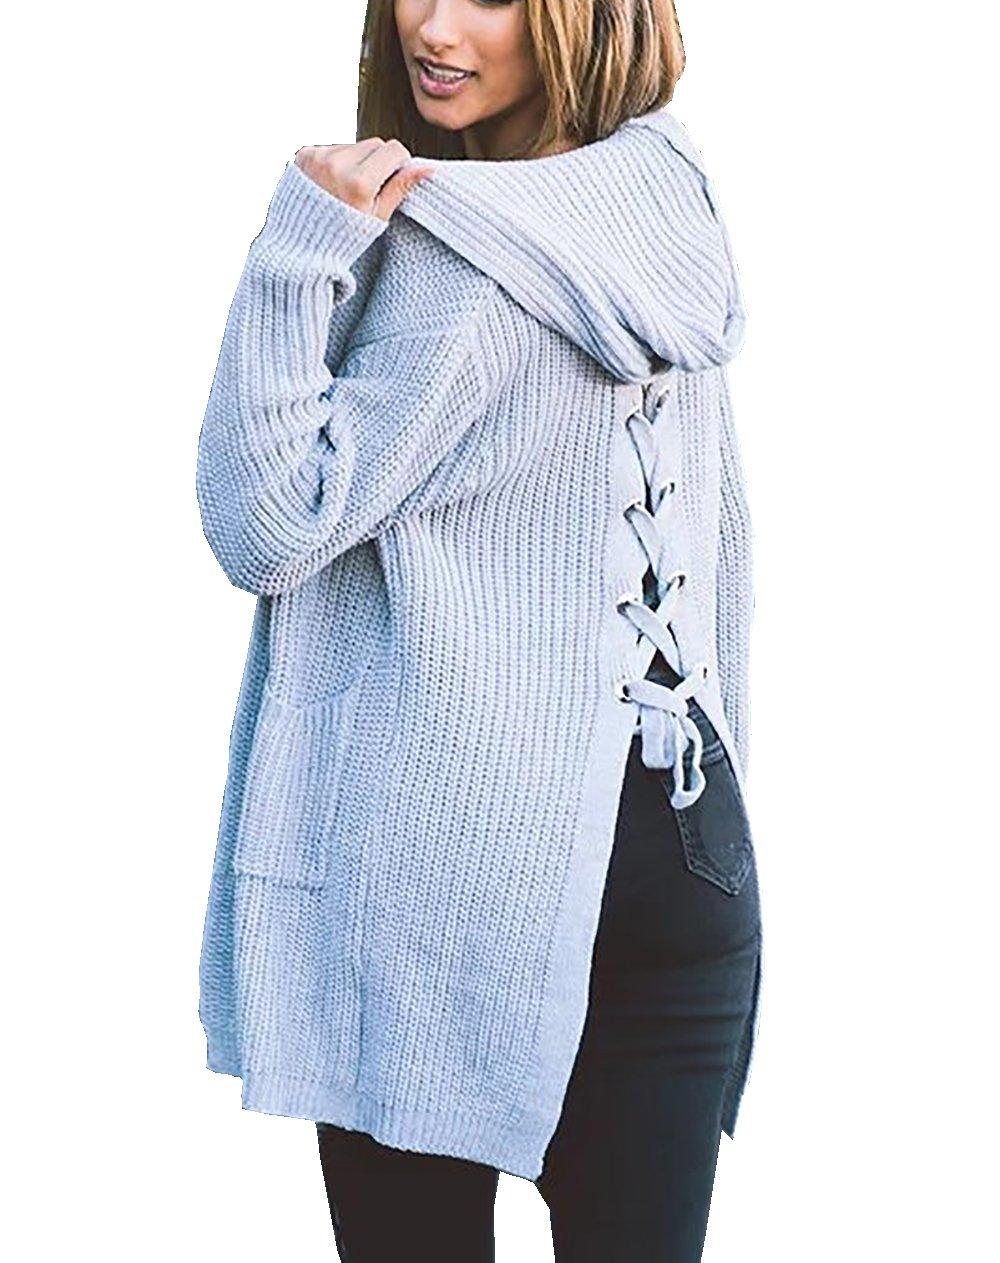 CoCo Fashion Damen Longstrickjacke Strick Bluse Cardigan Jacke mit Langarm (Einheitsgröße, Grau)